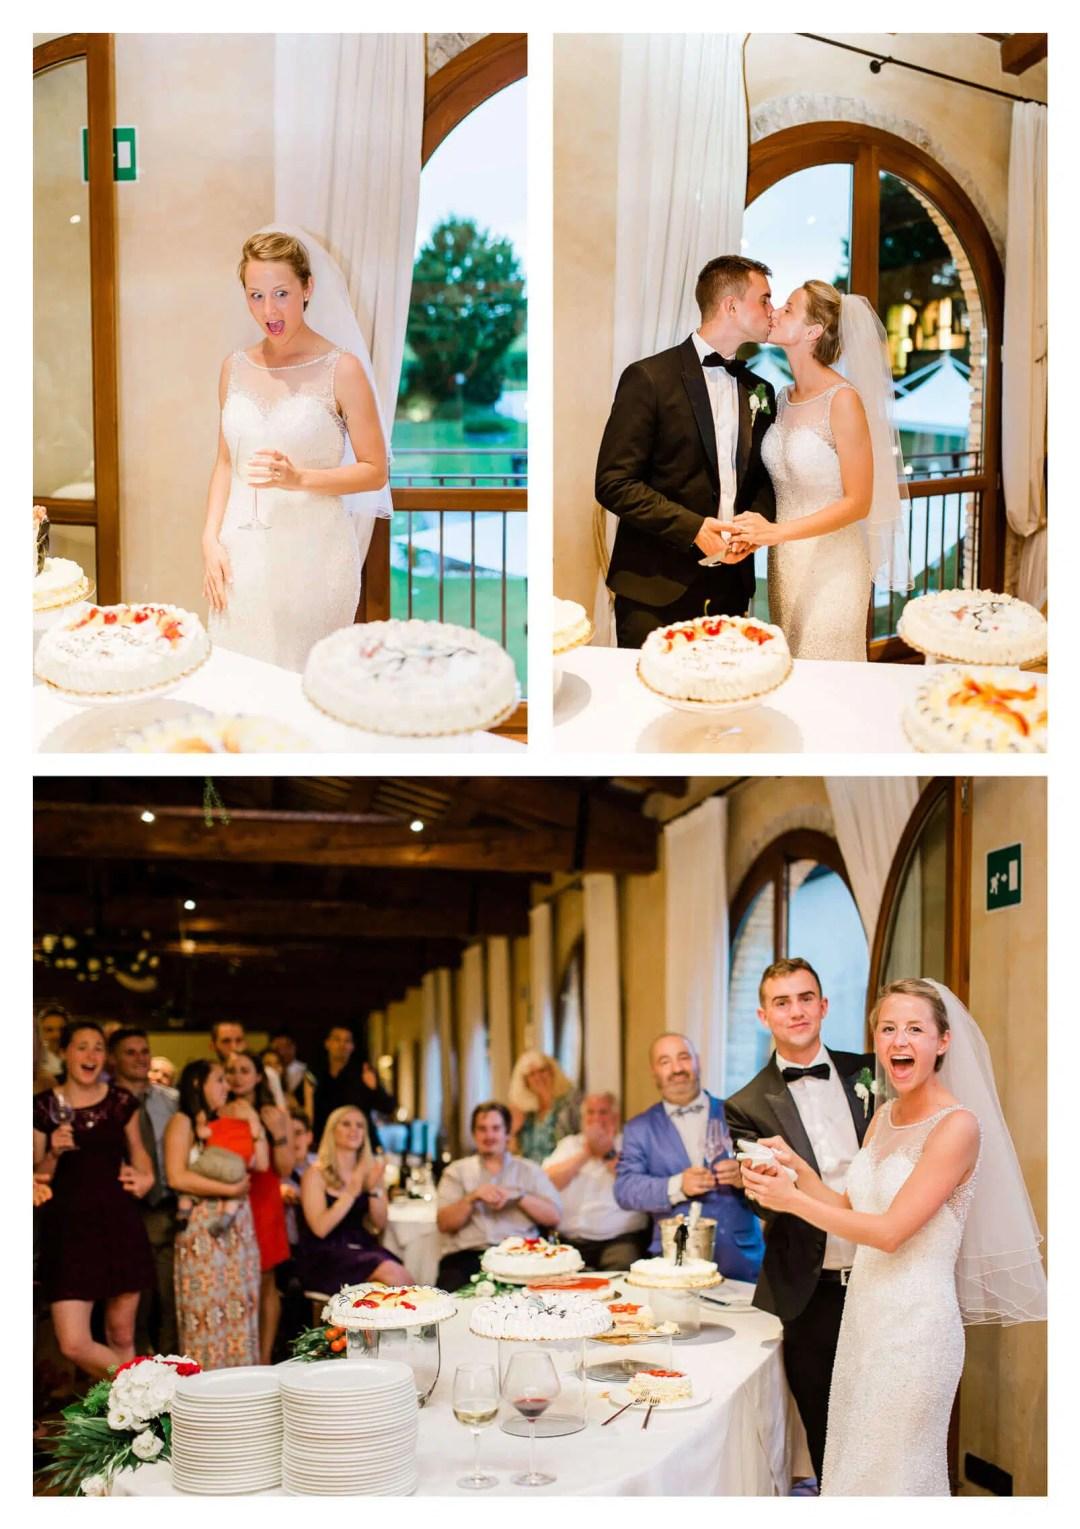 Cake cutting at Fossa Mala wedding | Destination photographer